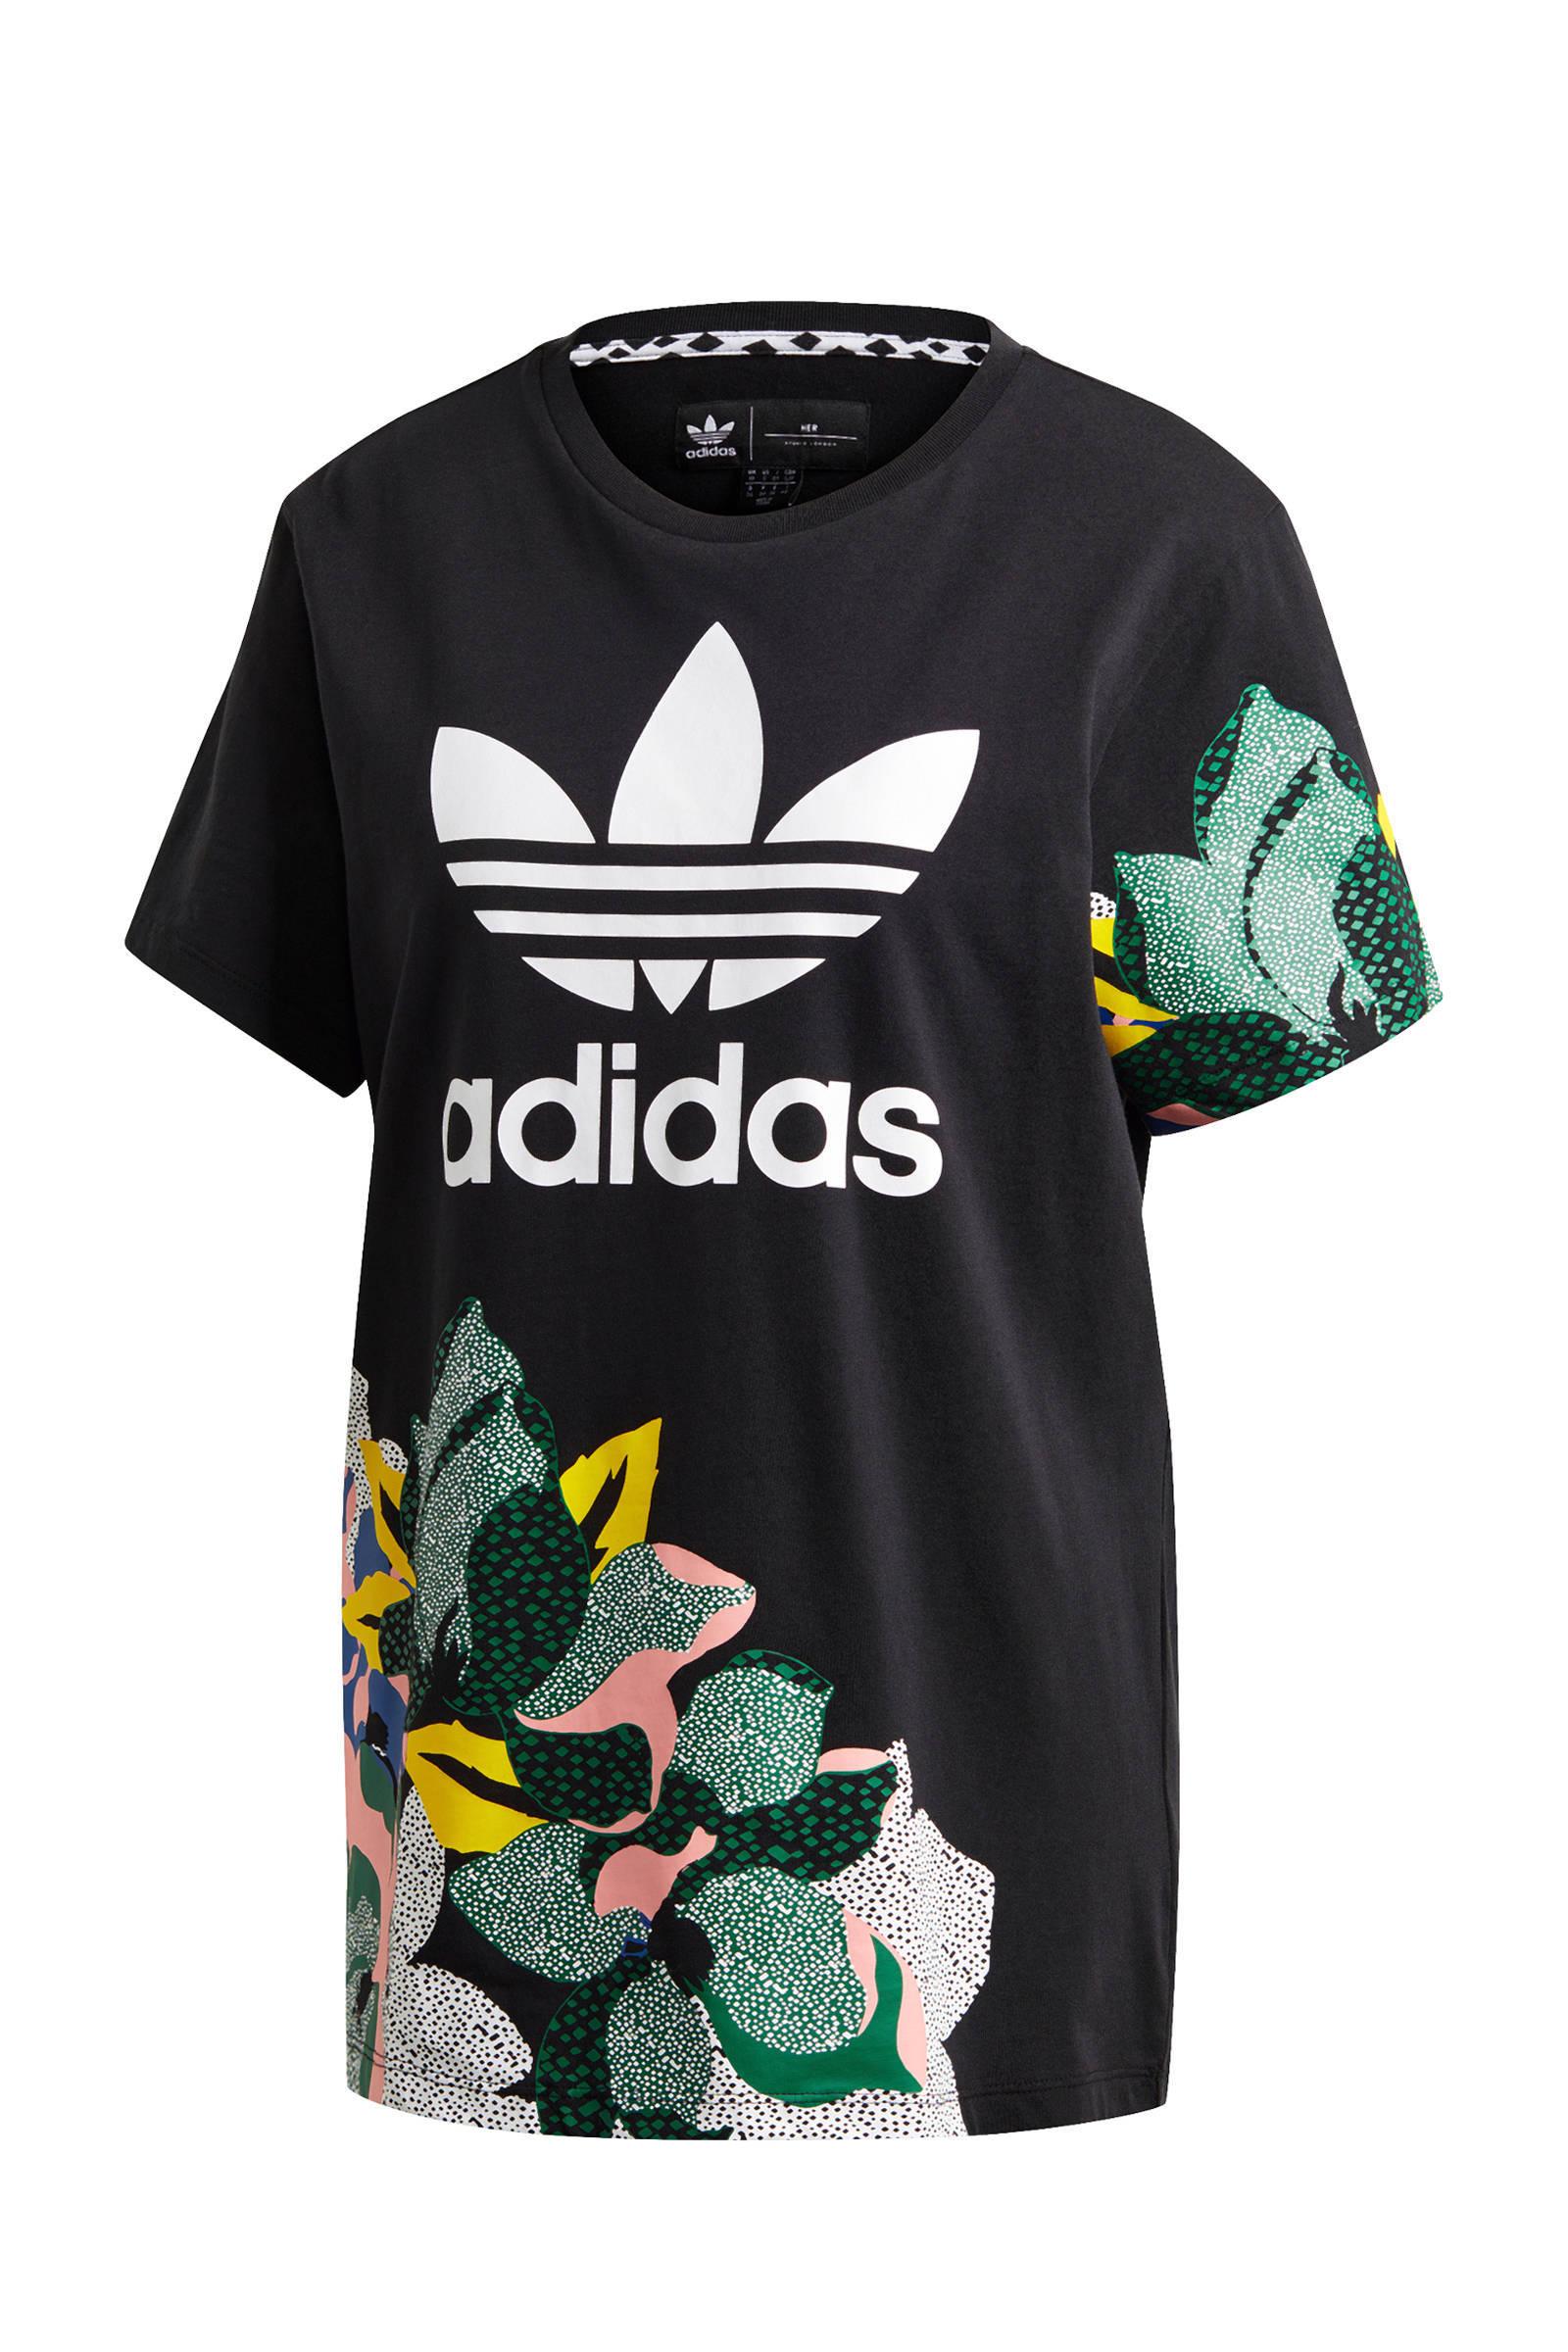 adidas Originals T shirt zwartmulti | wehkamp